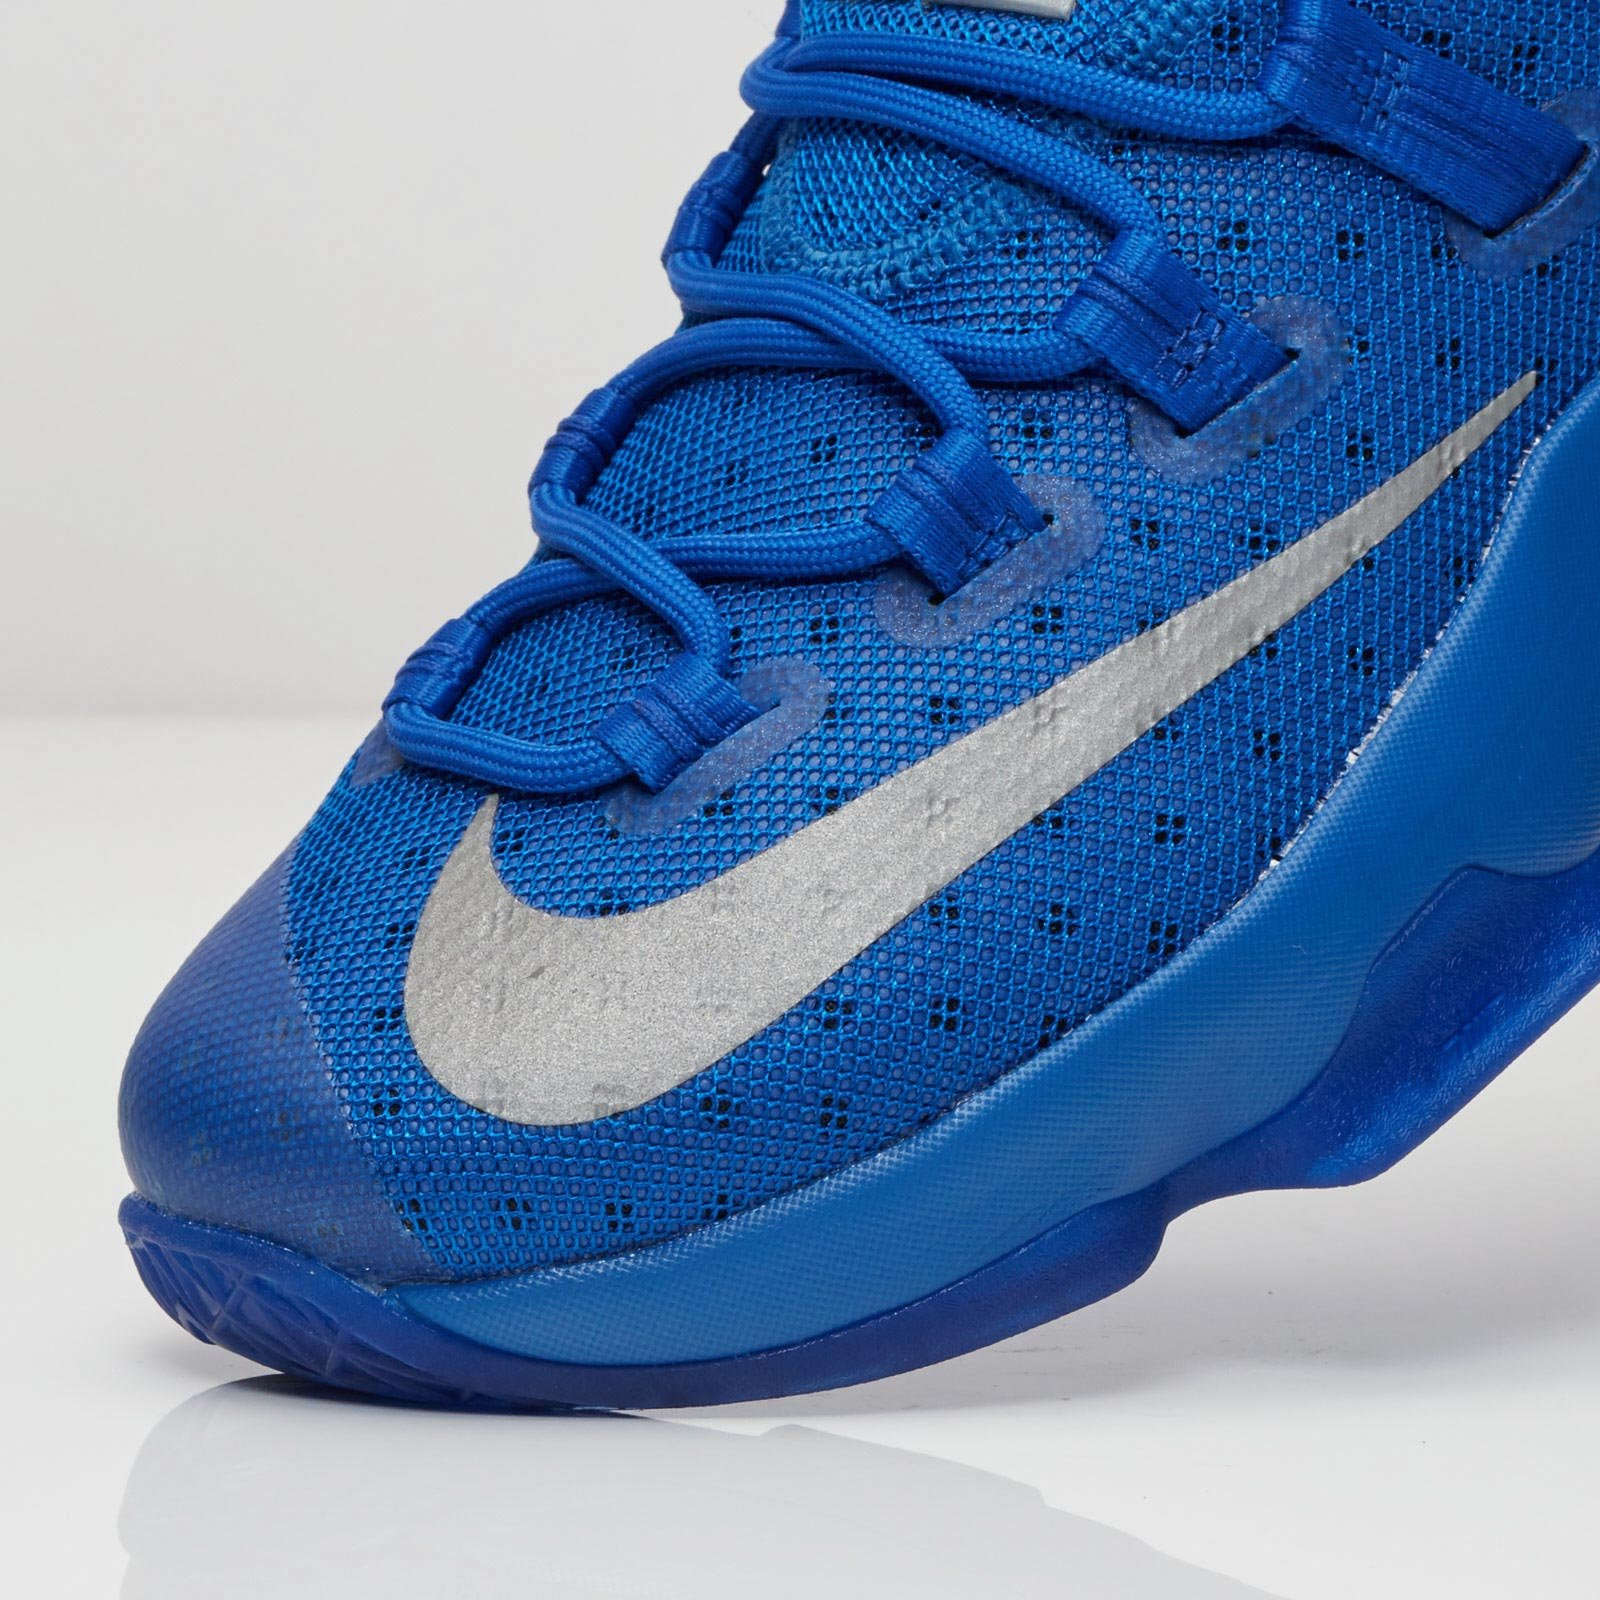 huge discount 97427 c4c58 Nike Lebron XIII Low - 831925-400 - Sneakersnstuff   sneakers   streetwear  online since 1999